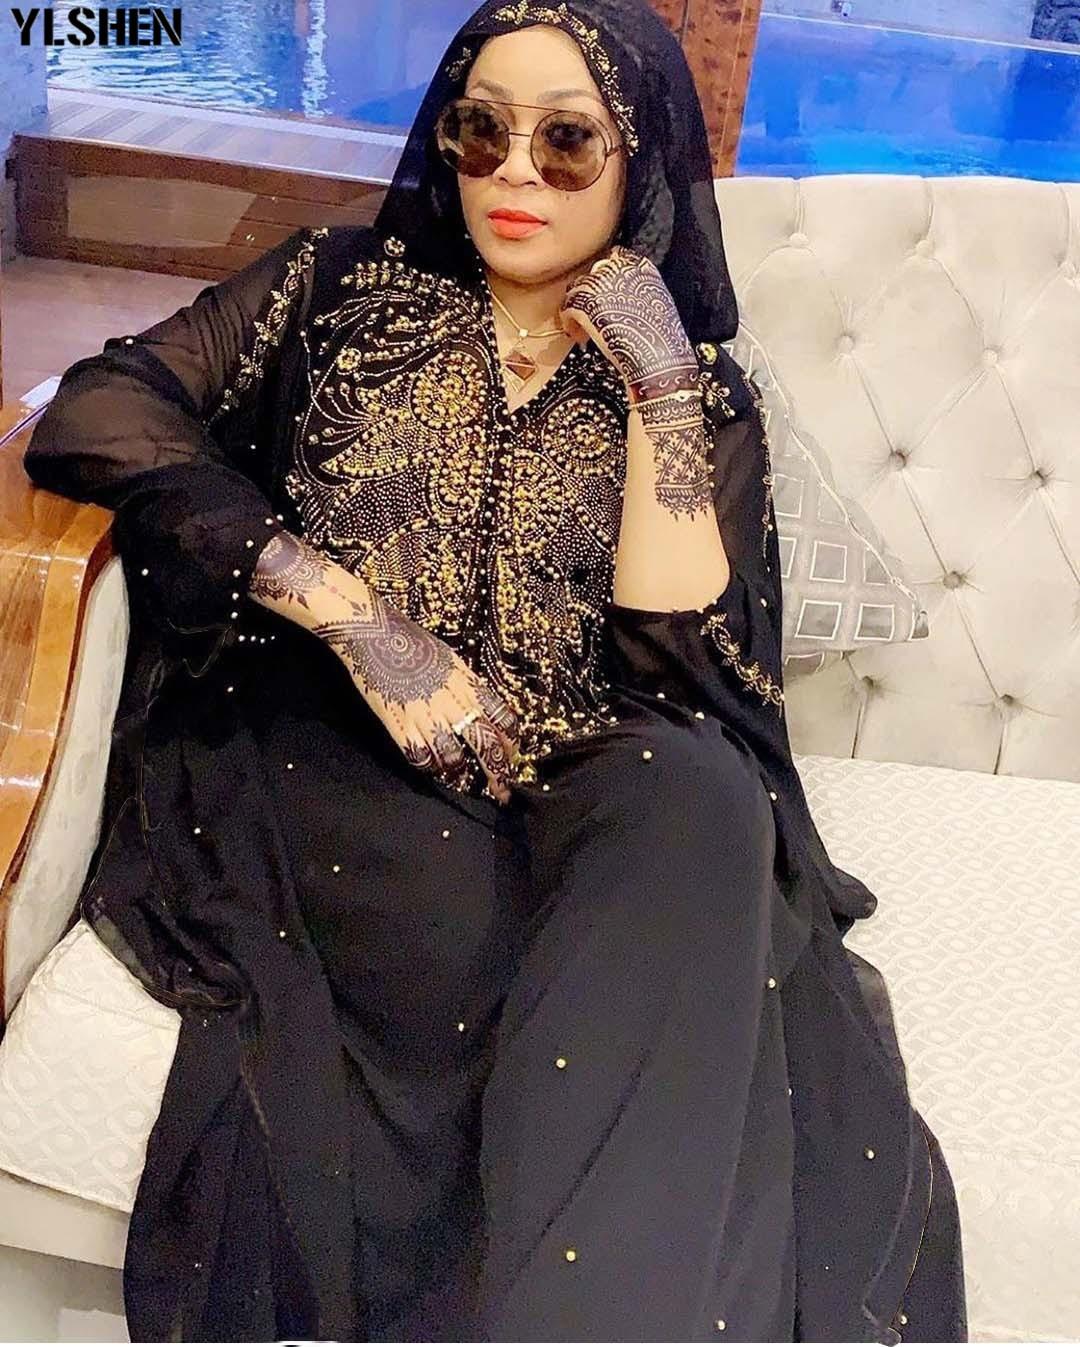 African Dresses For Women Dashiki African Clothes Diamond Beads Abaya Dubai Robe Grand Boubou Africain Muslim Dress Hooded Cape